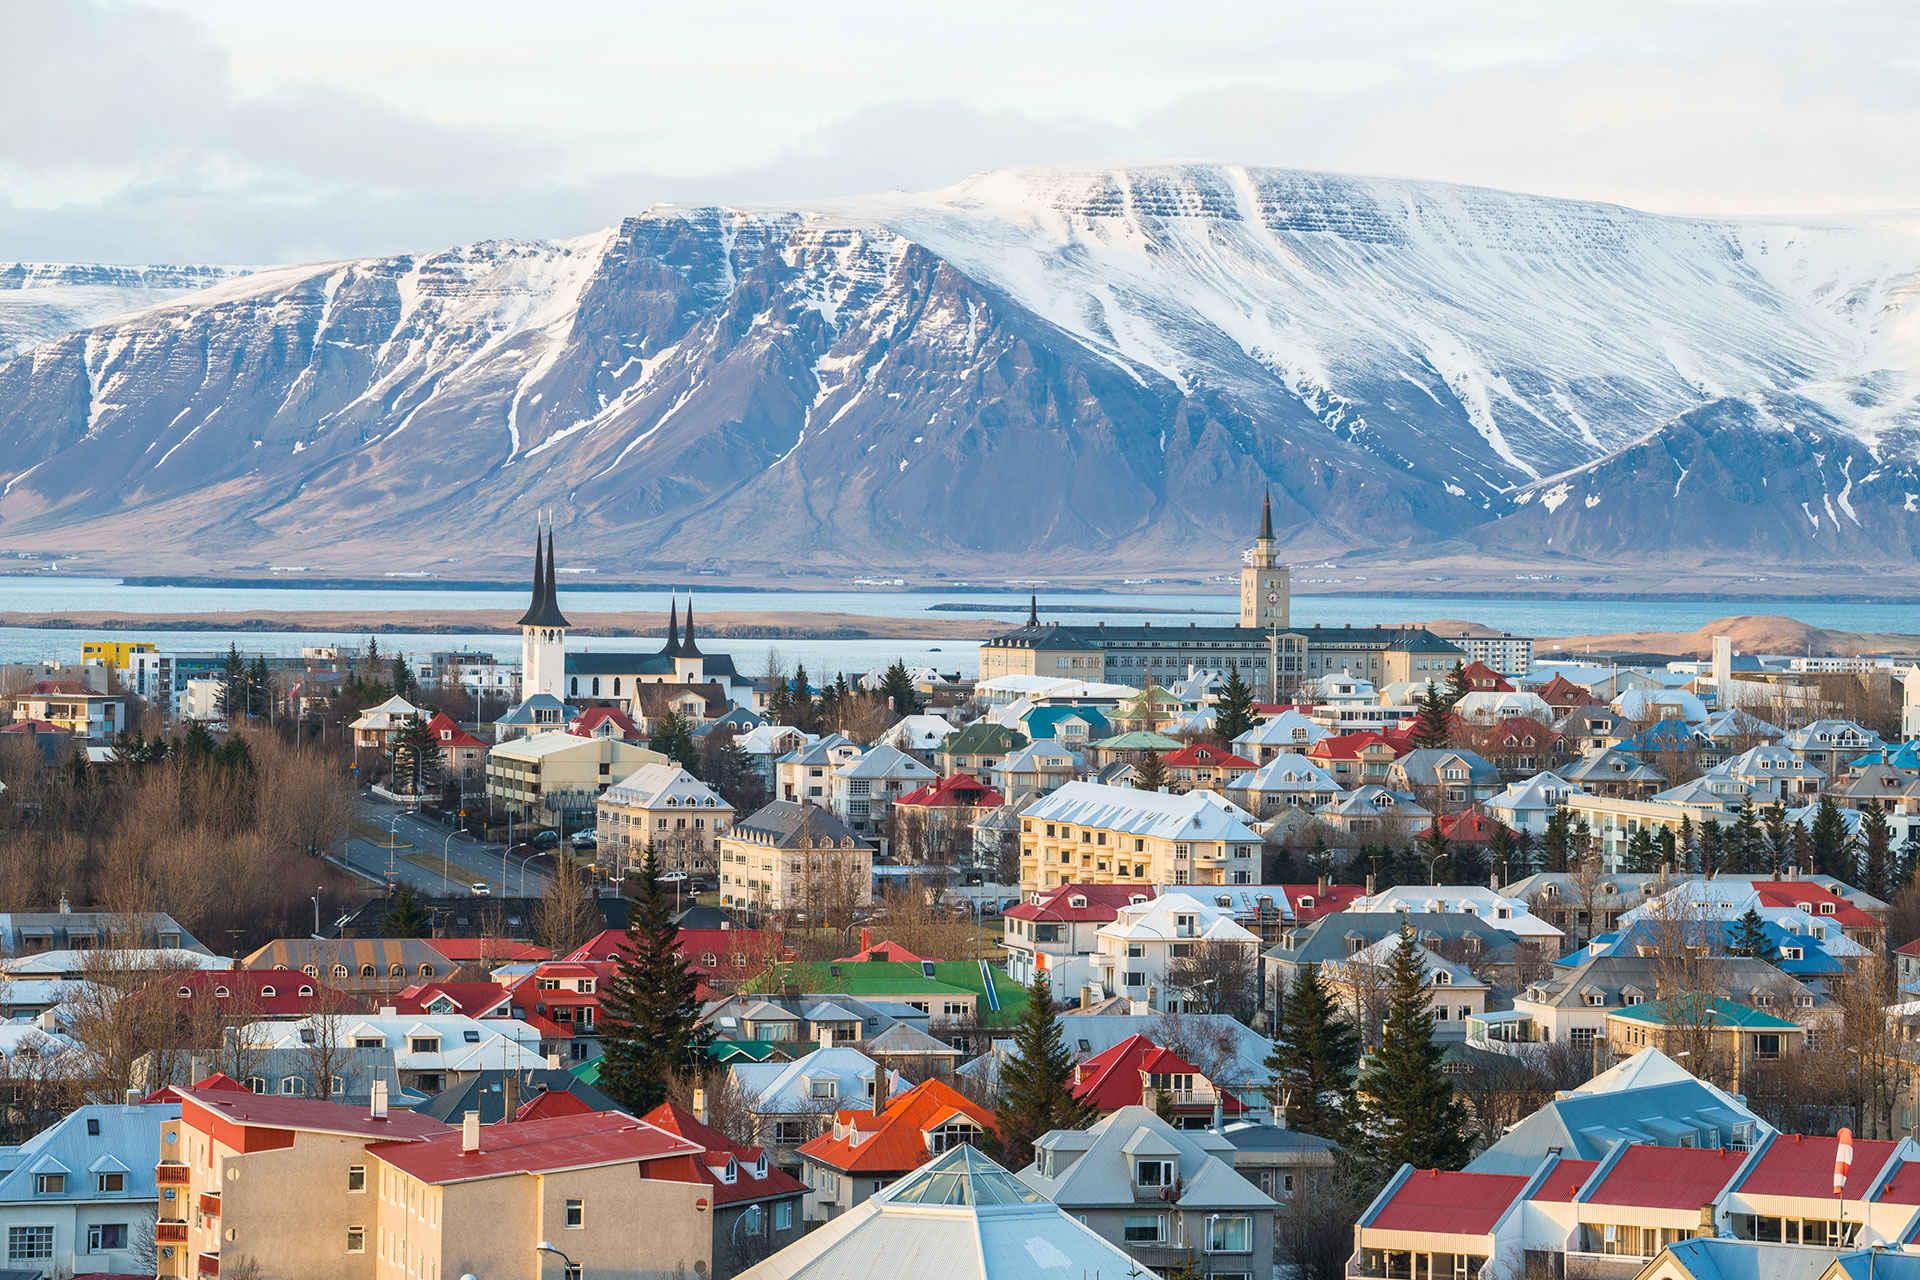 Iceland; Courtesy of Boyloso/Shutterstock.com